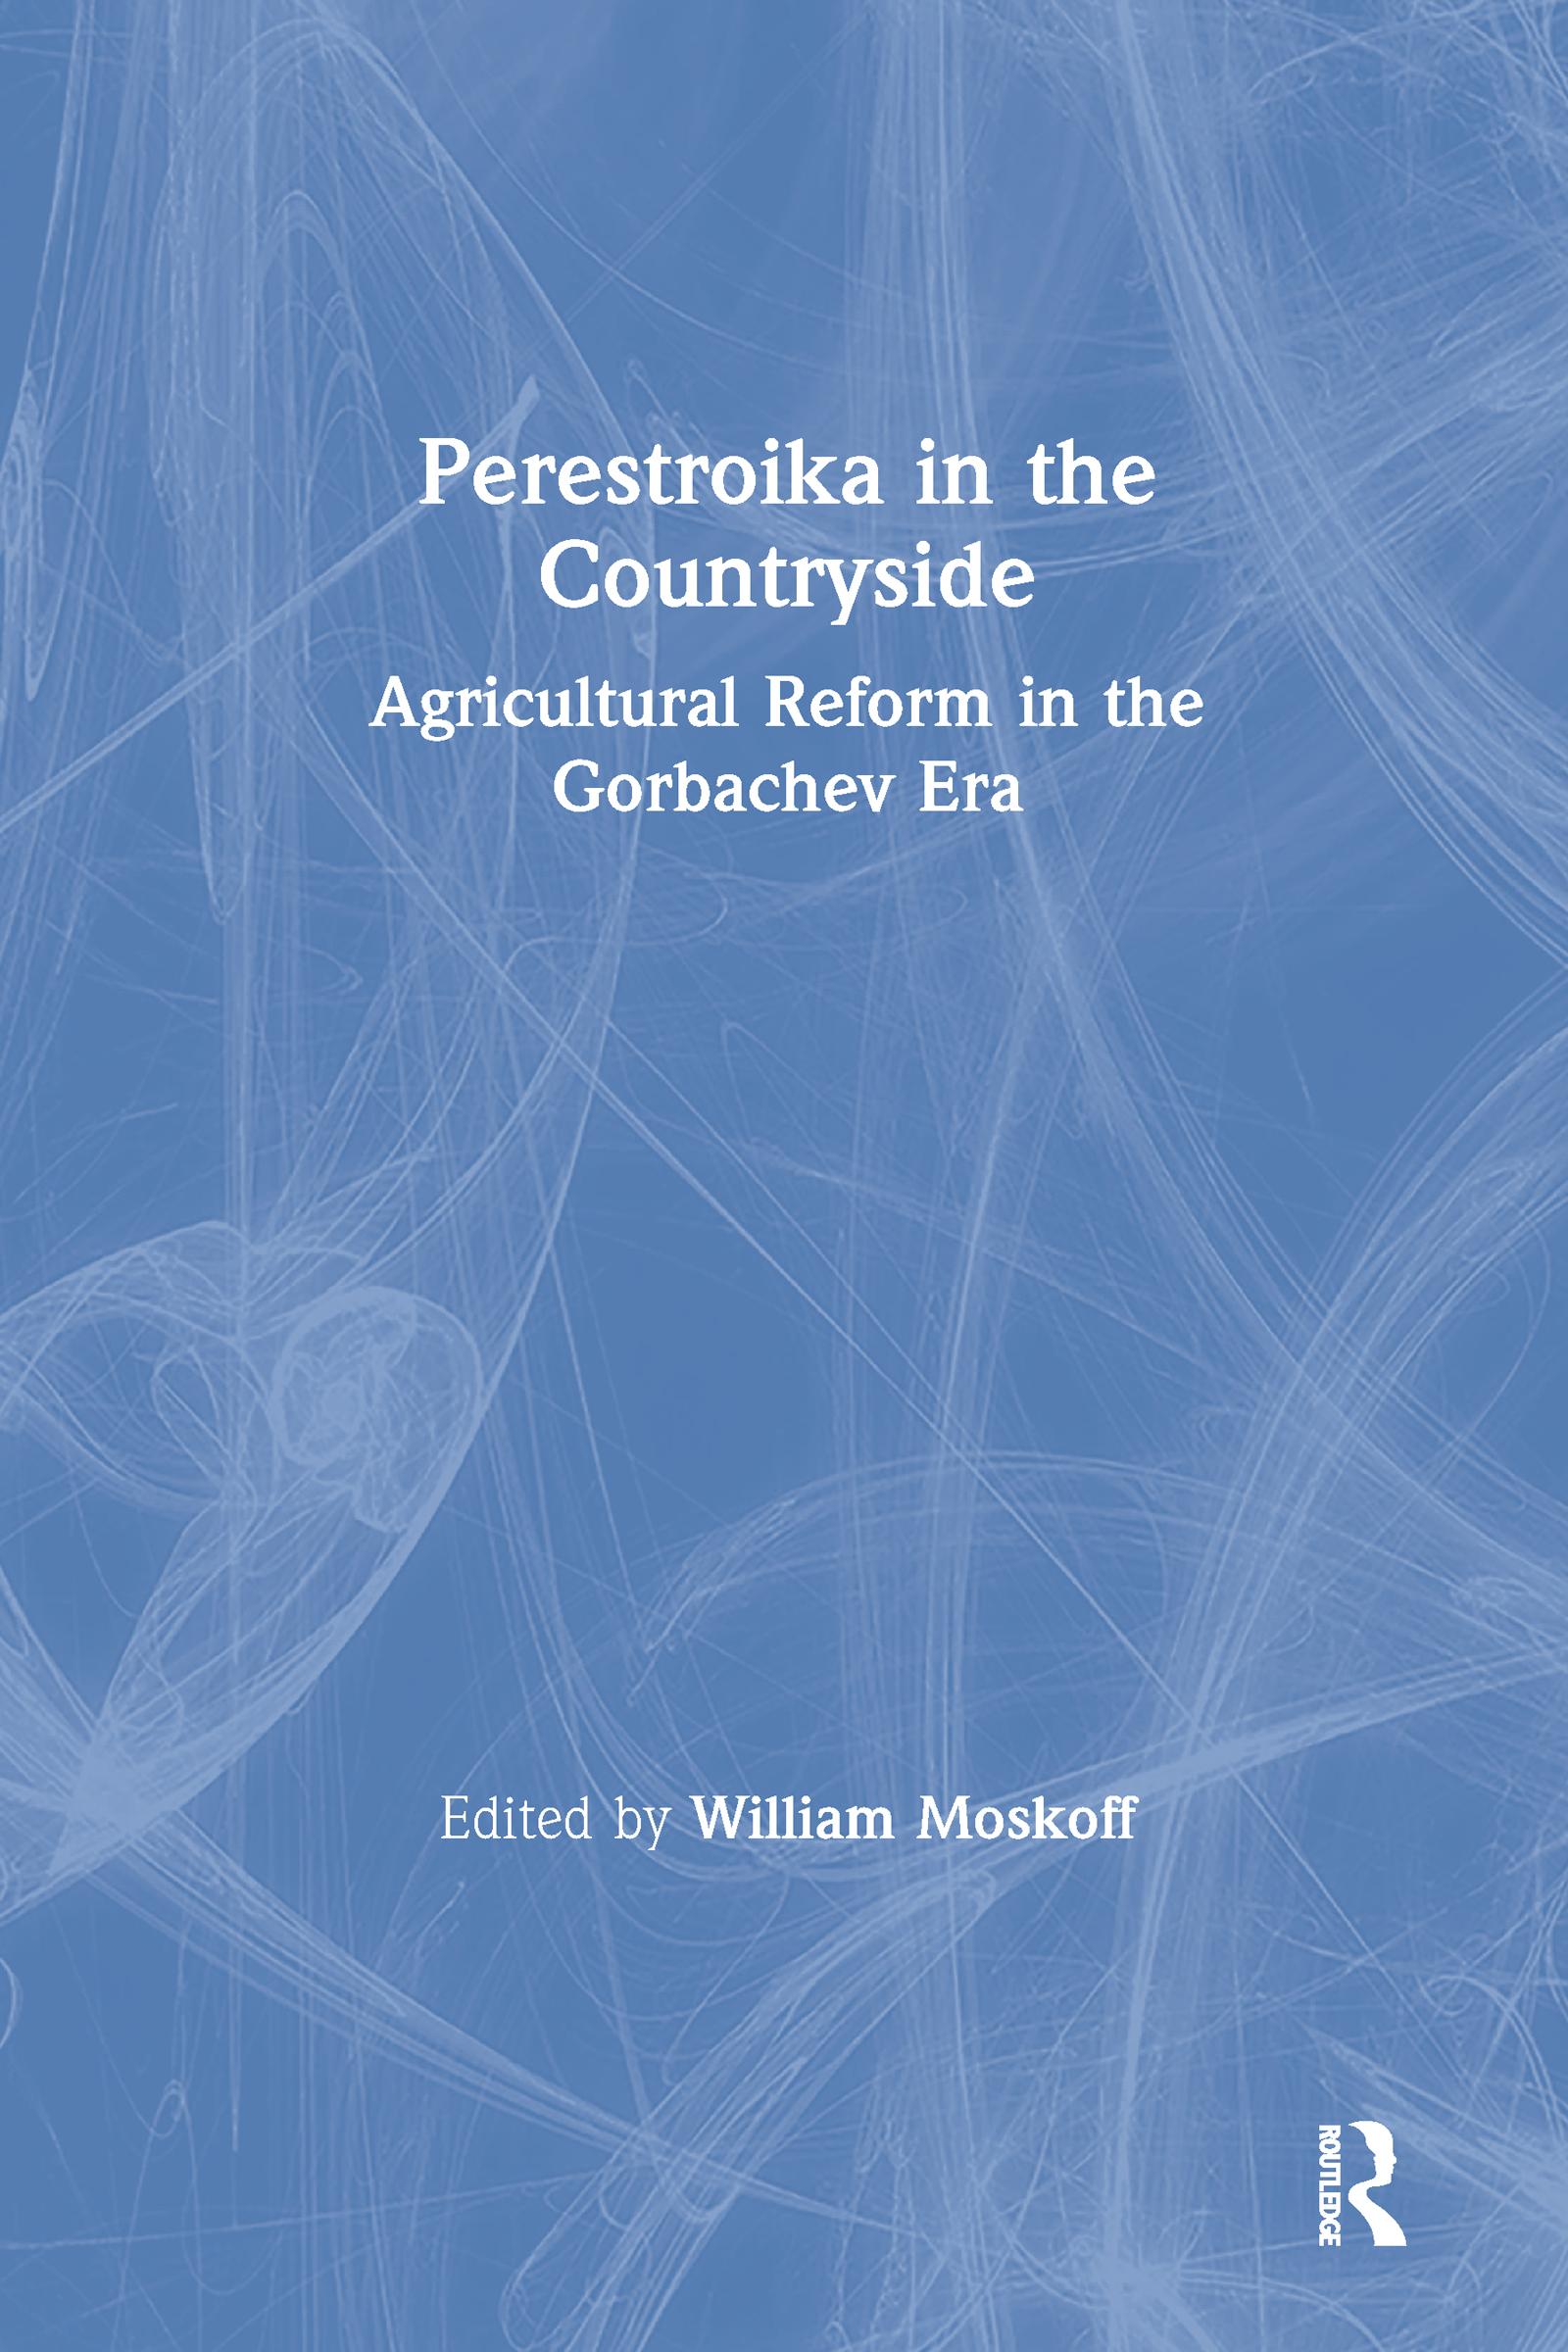 Perestroika in the Countryside: Agricultural Reform in the Gorbachev Era: Agricultural Reform in the Gorbachev Era book cover